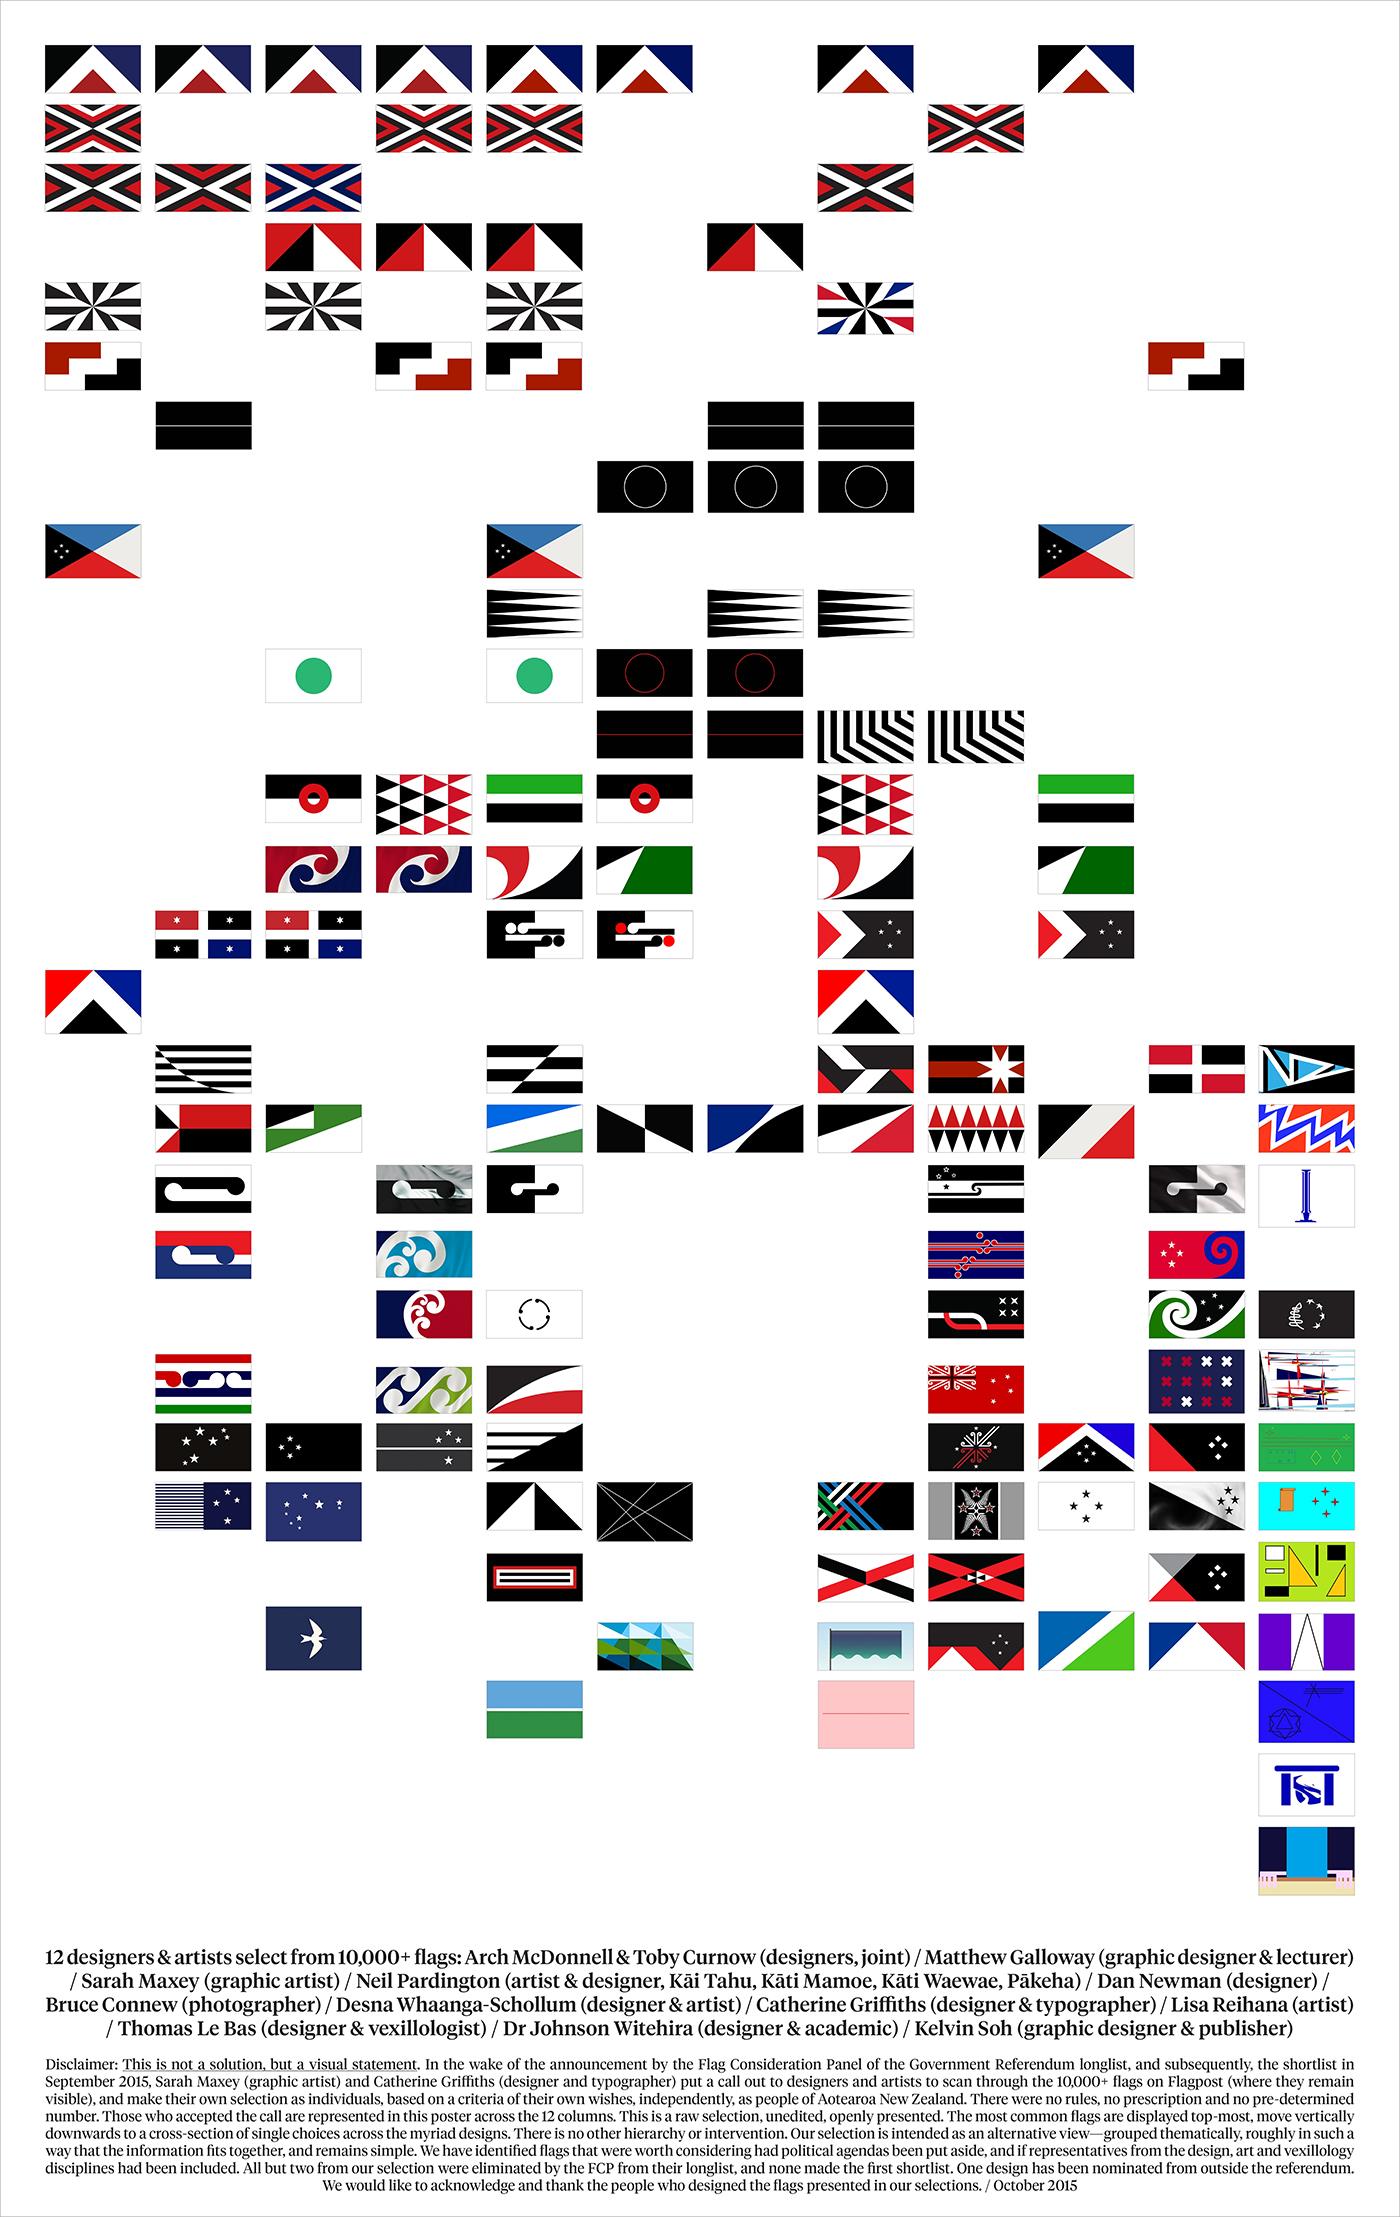 NZ Design - 98 Flags — Threaded Magazine